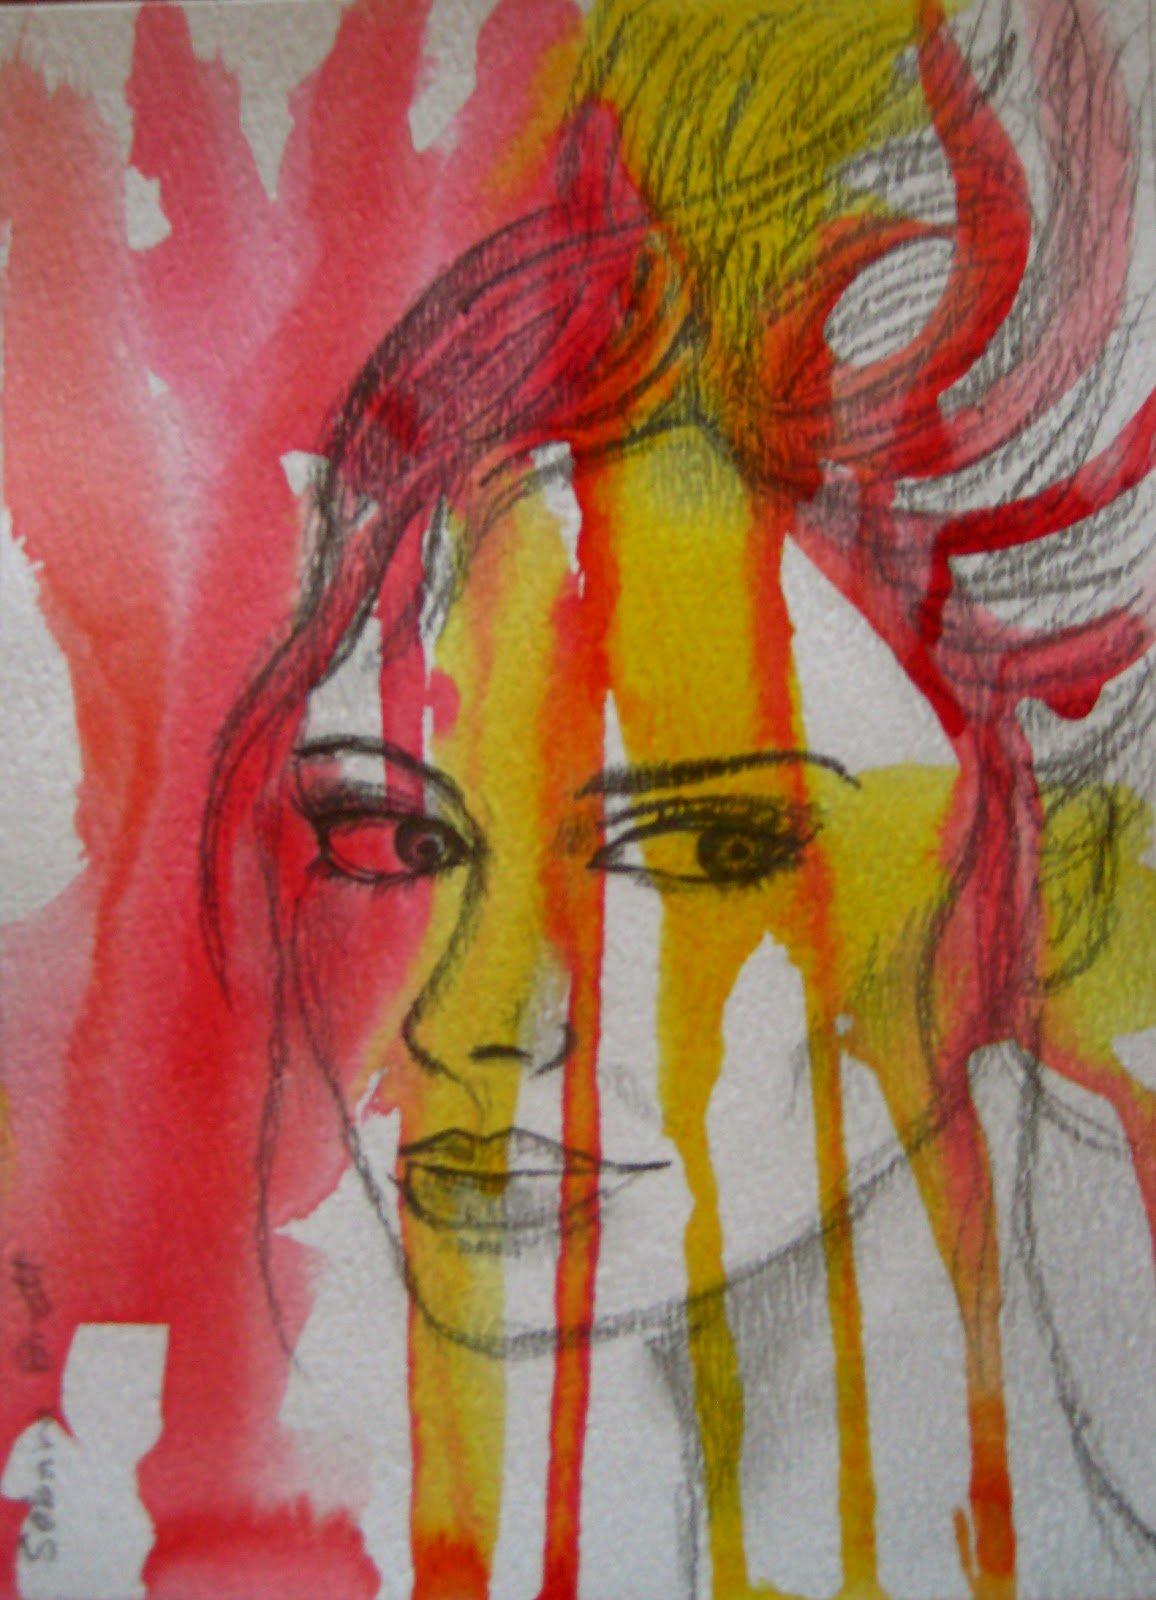 Fire & Light Series by Sabrina Brett 2